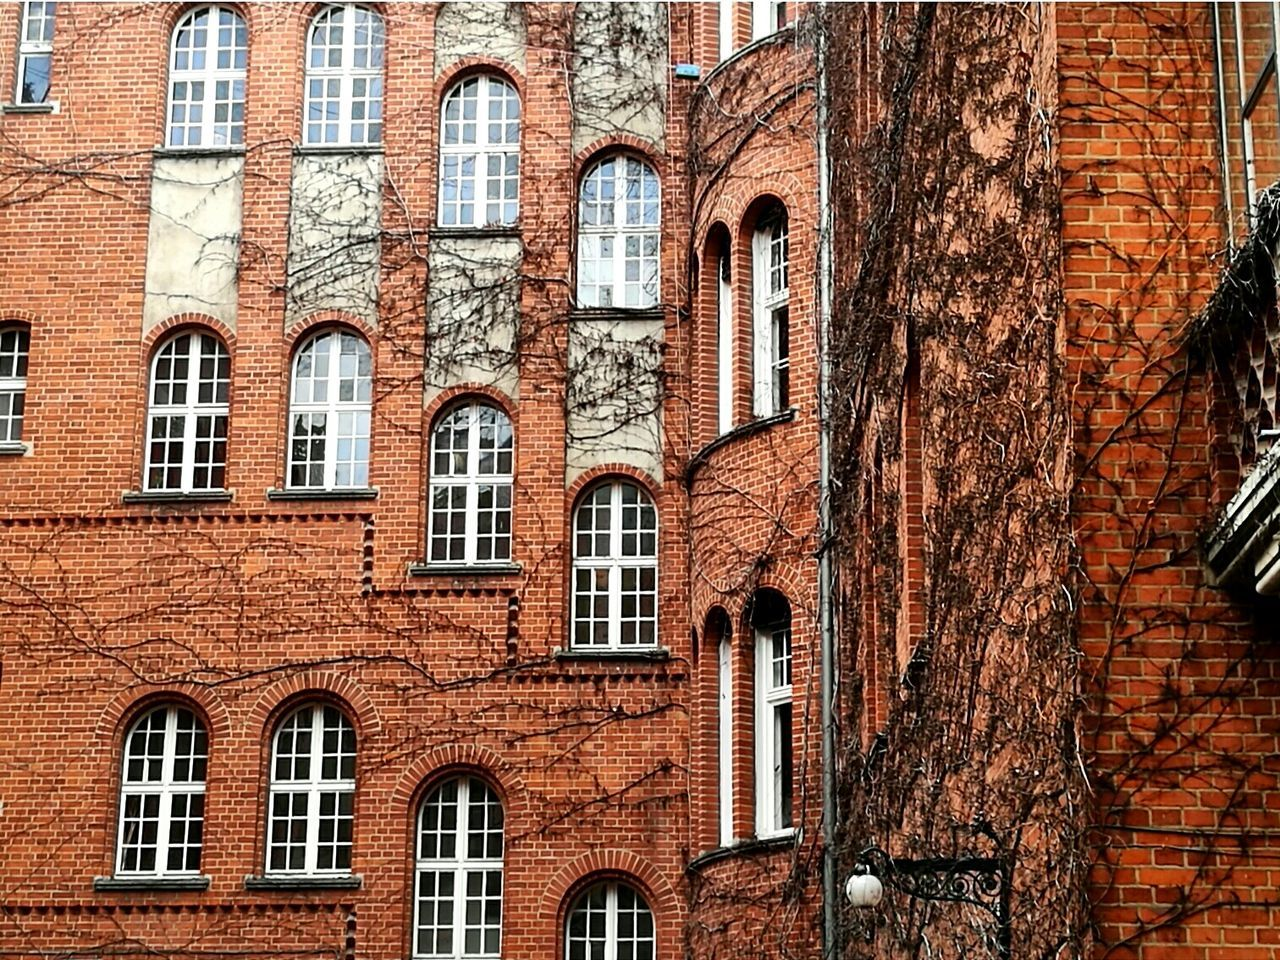 Berlin Facade Building Architecture Stone Wall Brick Wall Outdoors No People First Eyeem Photo Berlin Photography Backyard EyeEmNewHere